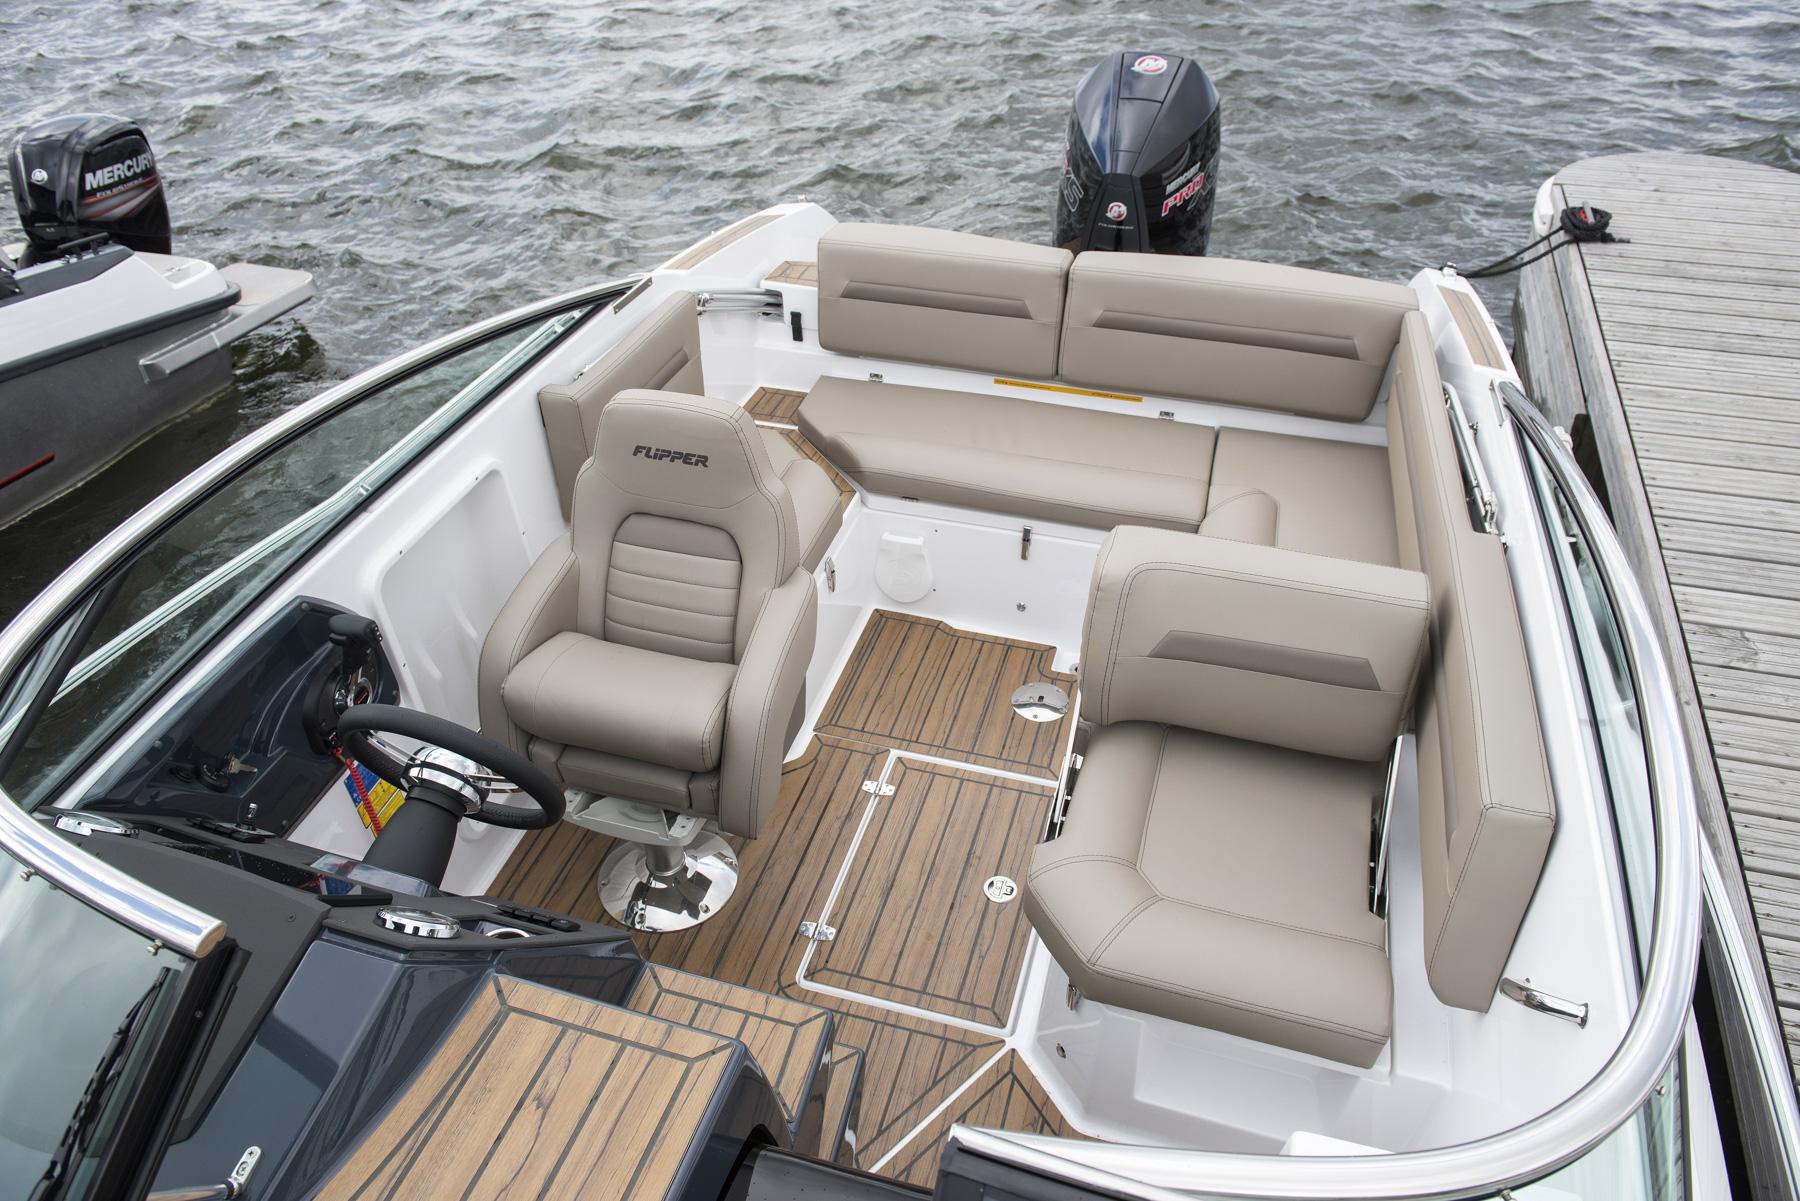 Flipper 650 Day Cruiser aft cockpit